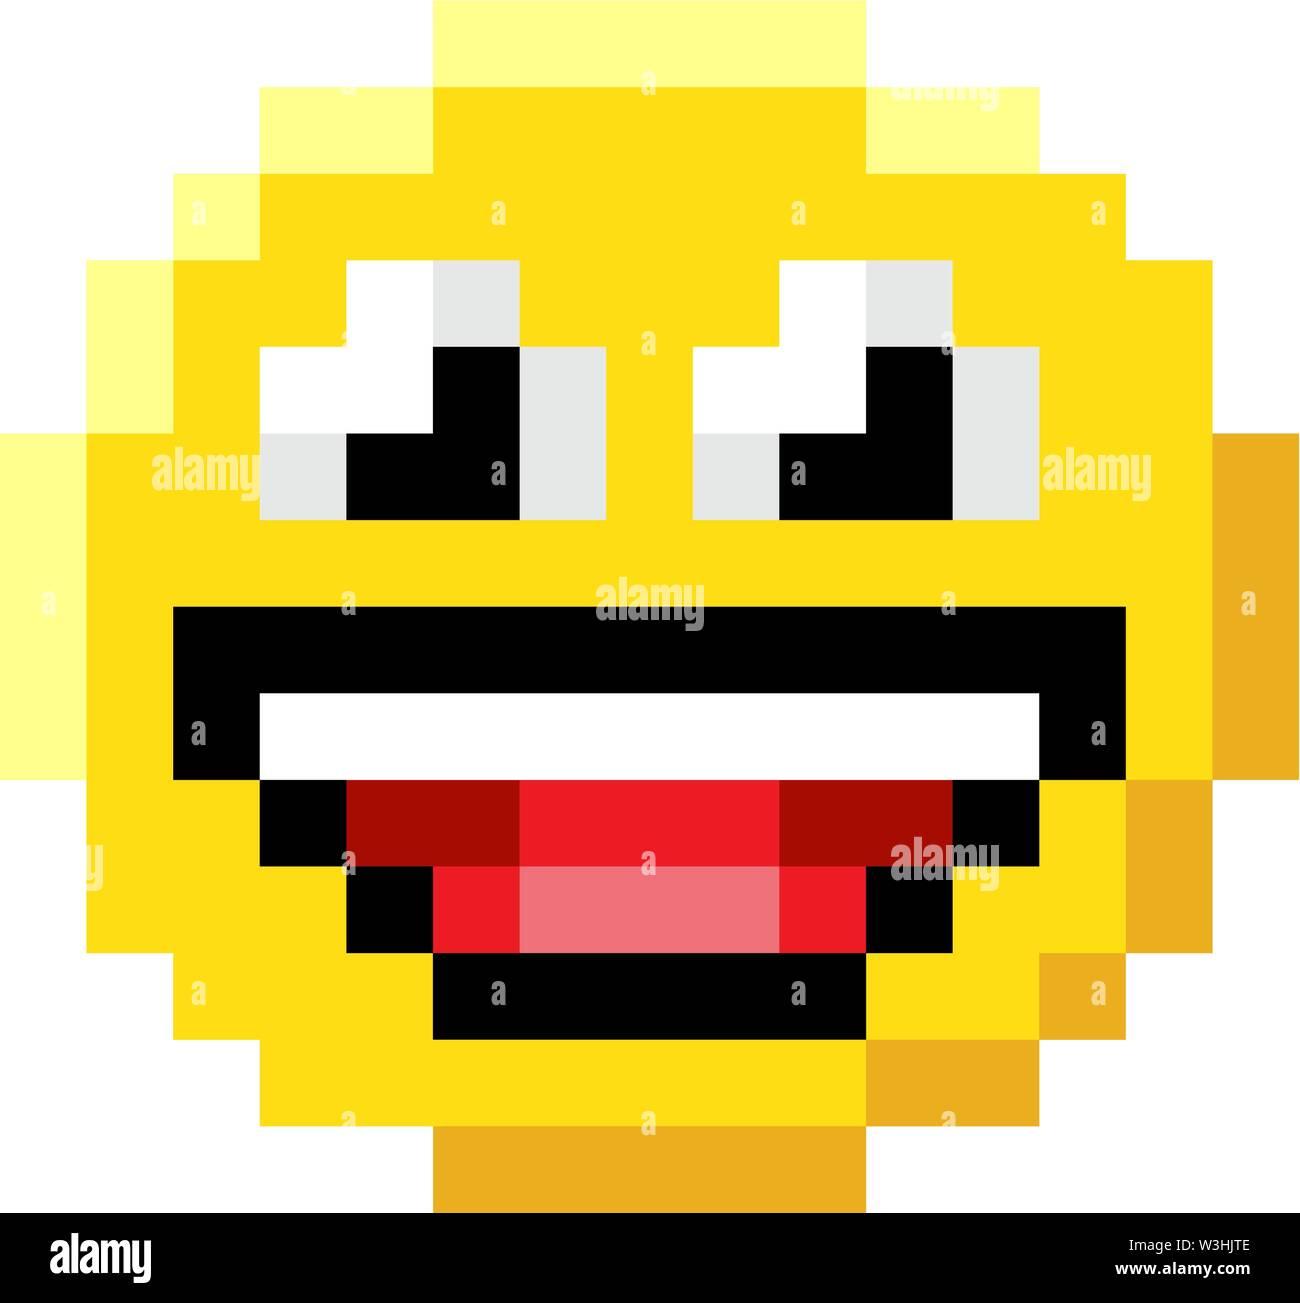 Visage D émoticônes Pixel Art 8 Bits L Icône Du Jeu Vidéo